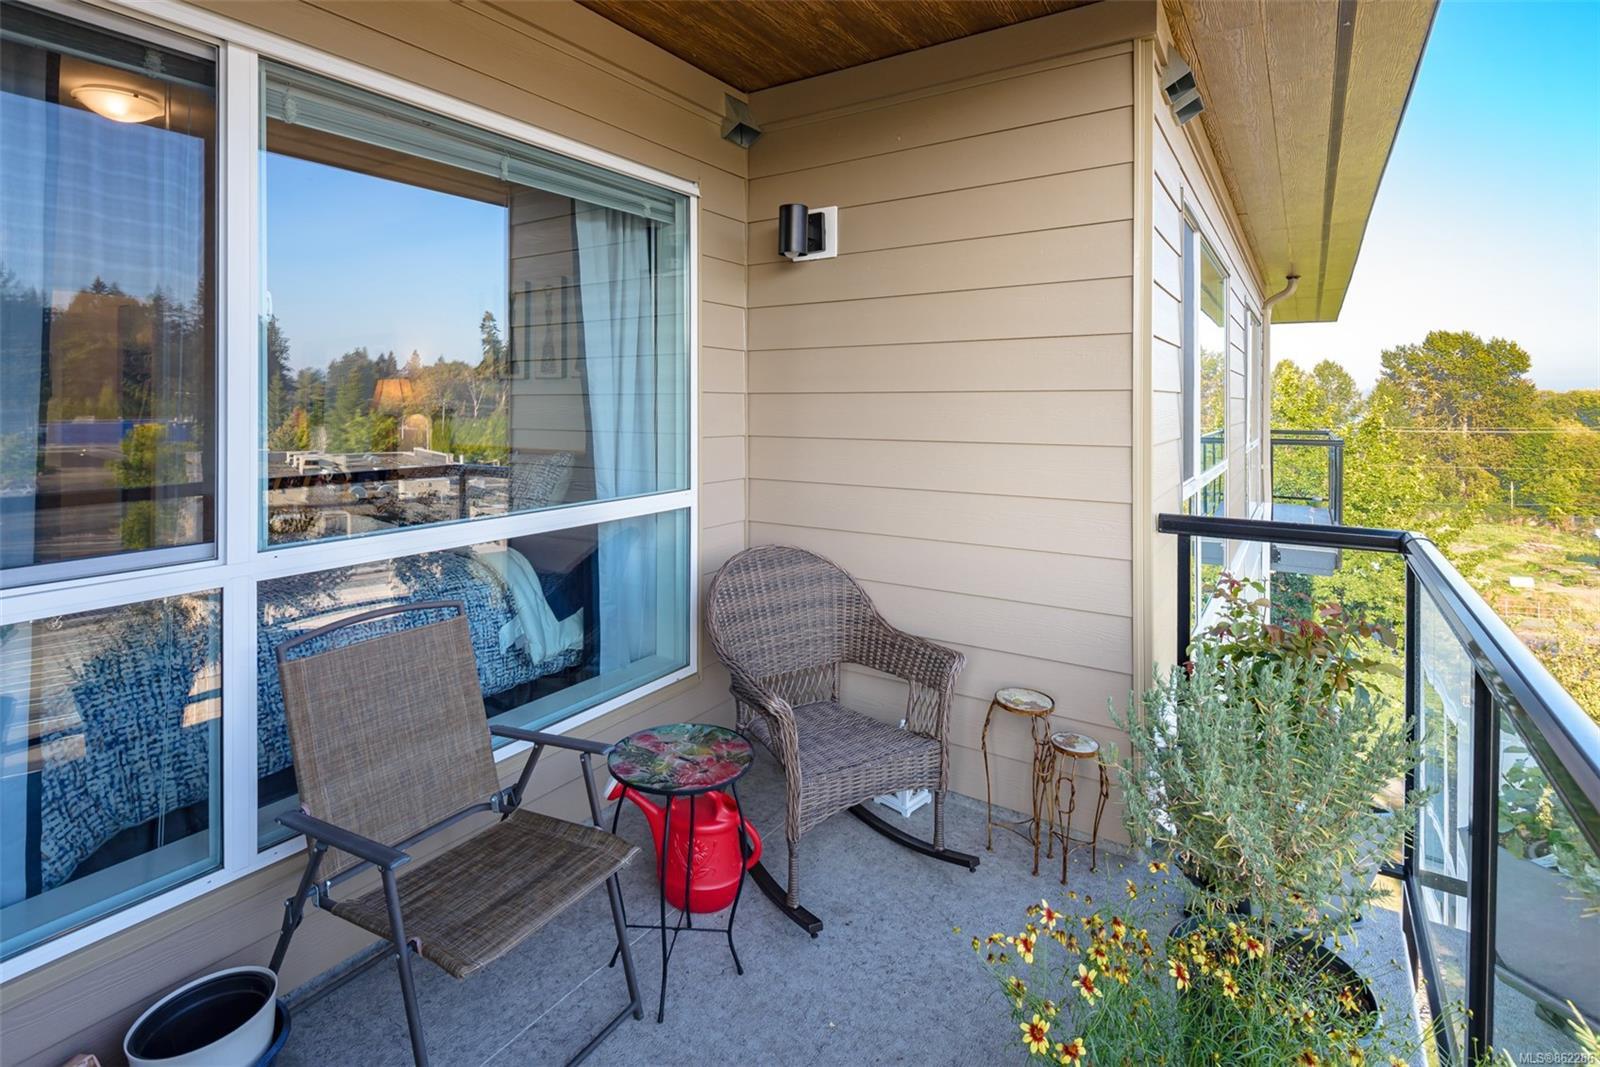 Main Photo: PH7 3070 Kilpatrick Ave in : CV Courtenay City Condo for sale (Comox Valley)  : MLS®# 862286